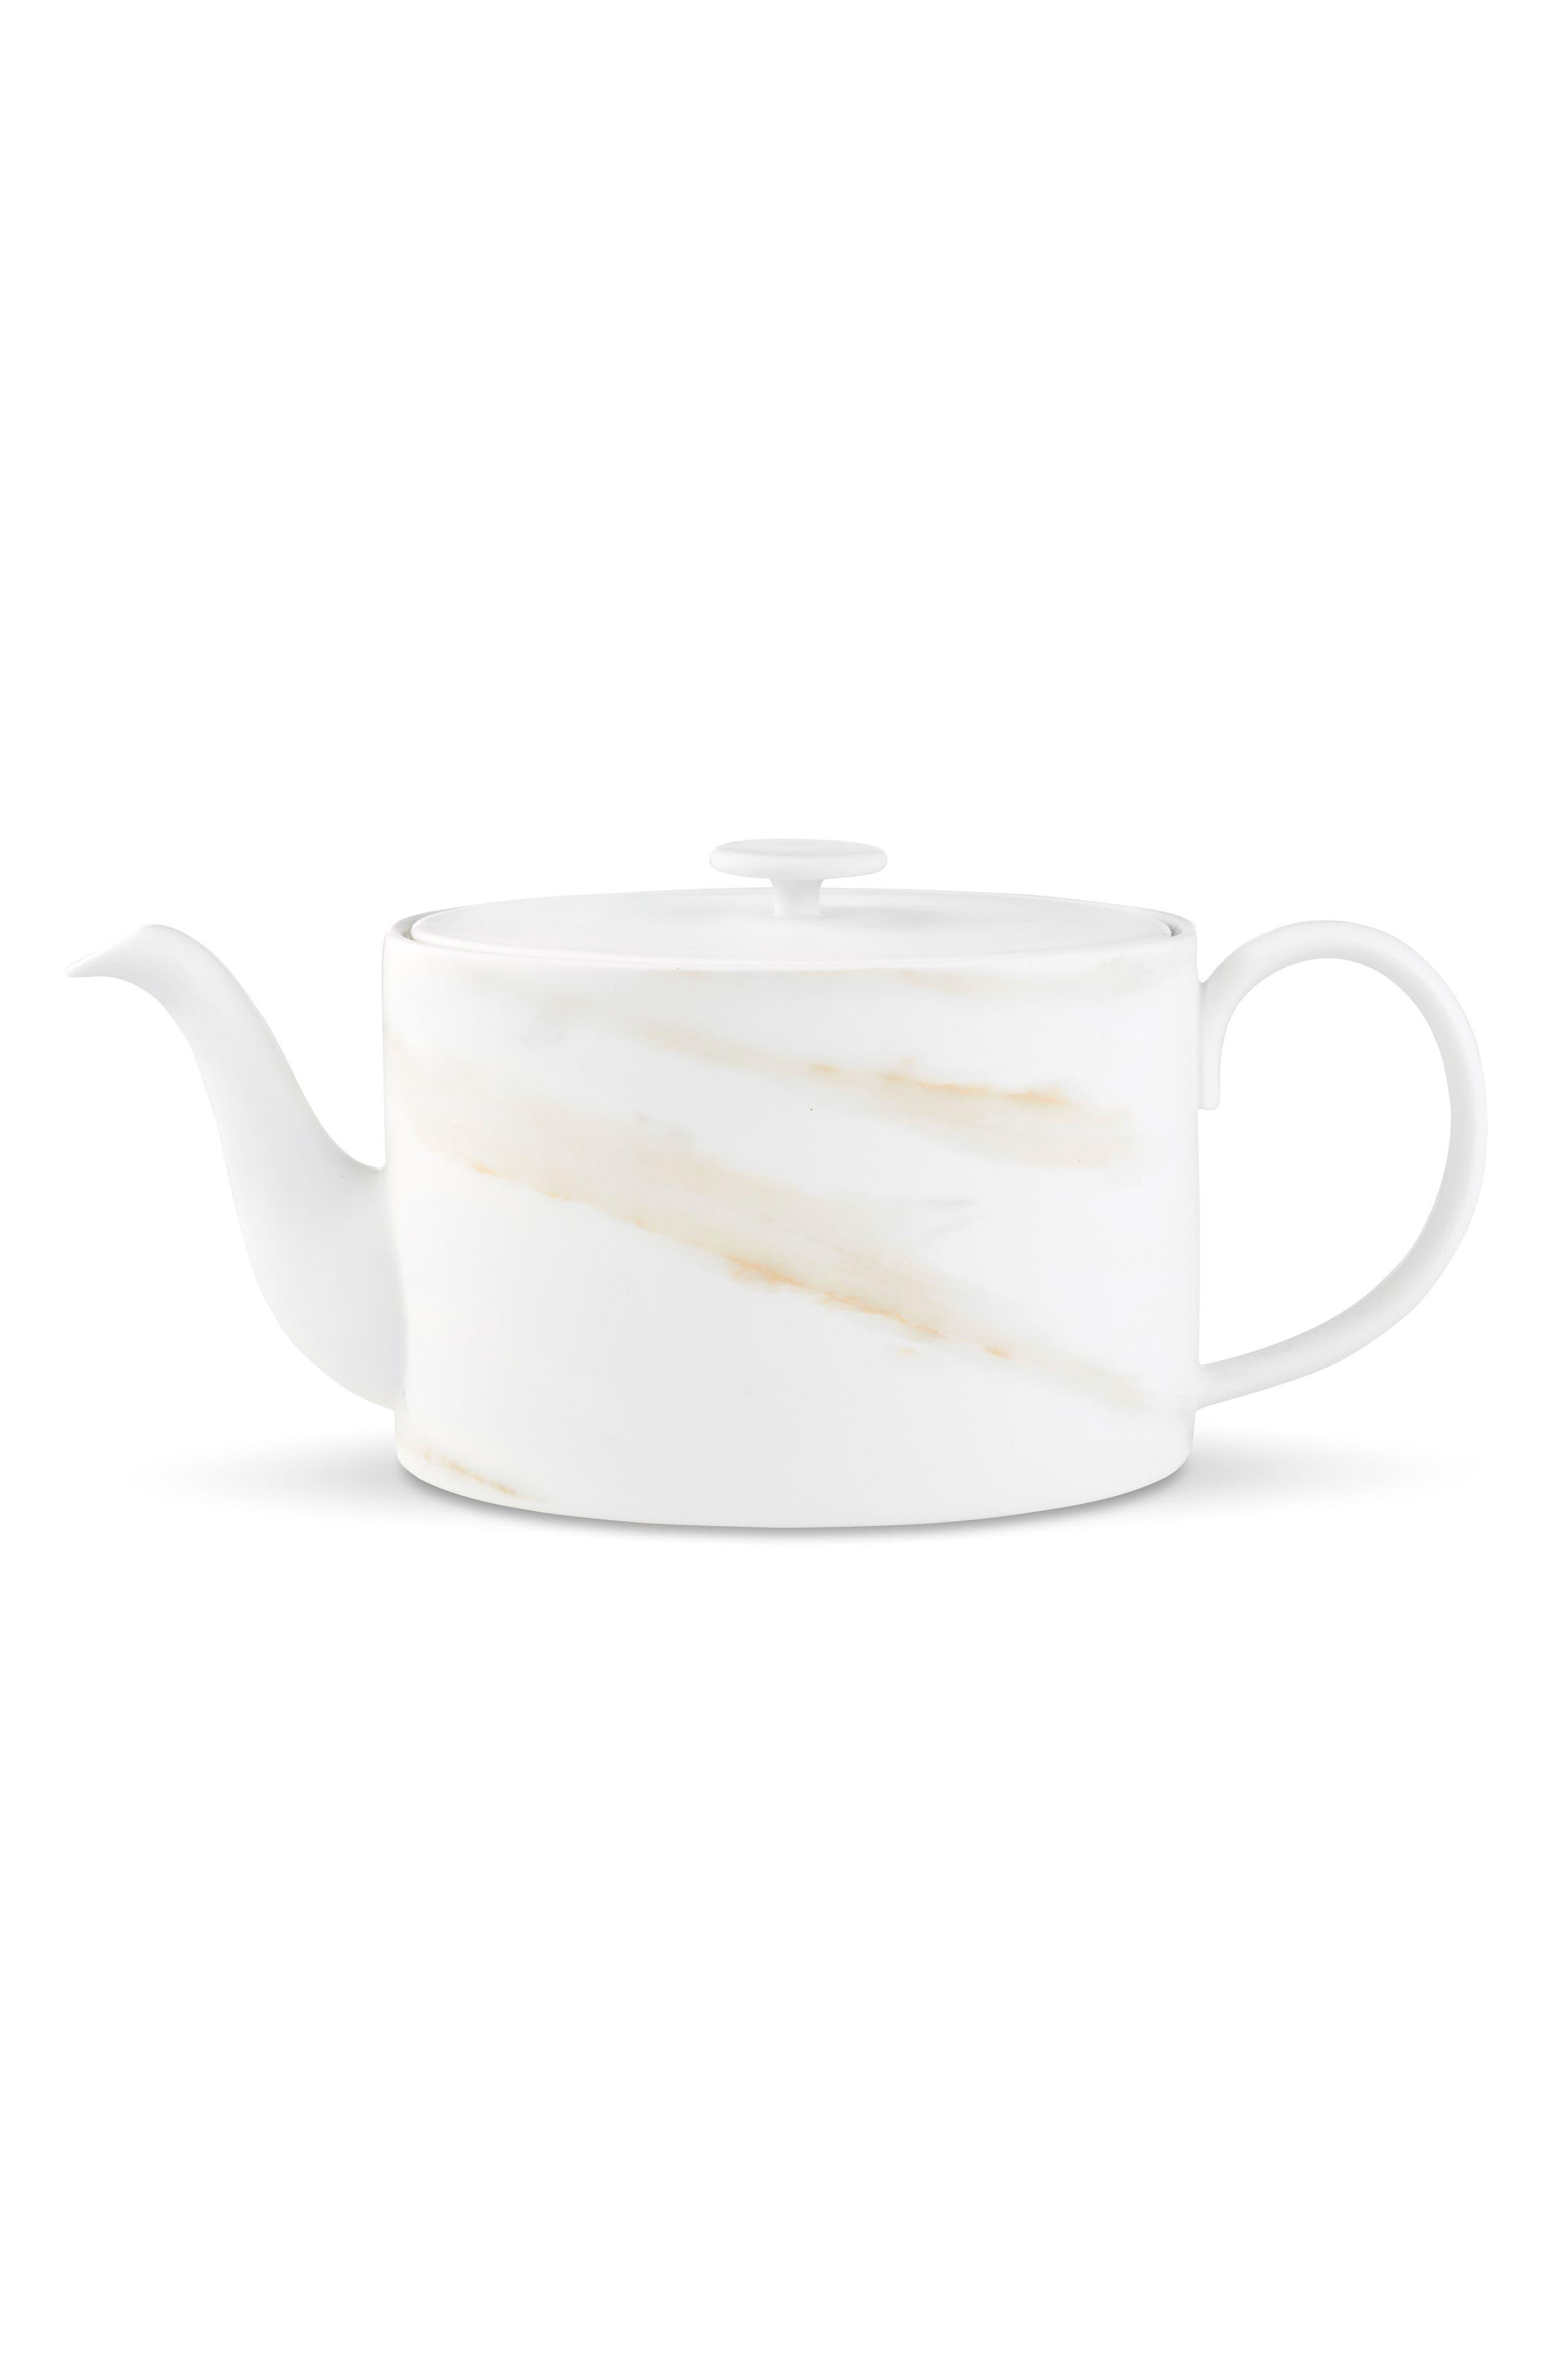 x Wedgwood Venato Imperial Teapot,                             Main thumbnail 1, color,